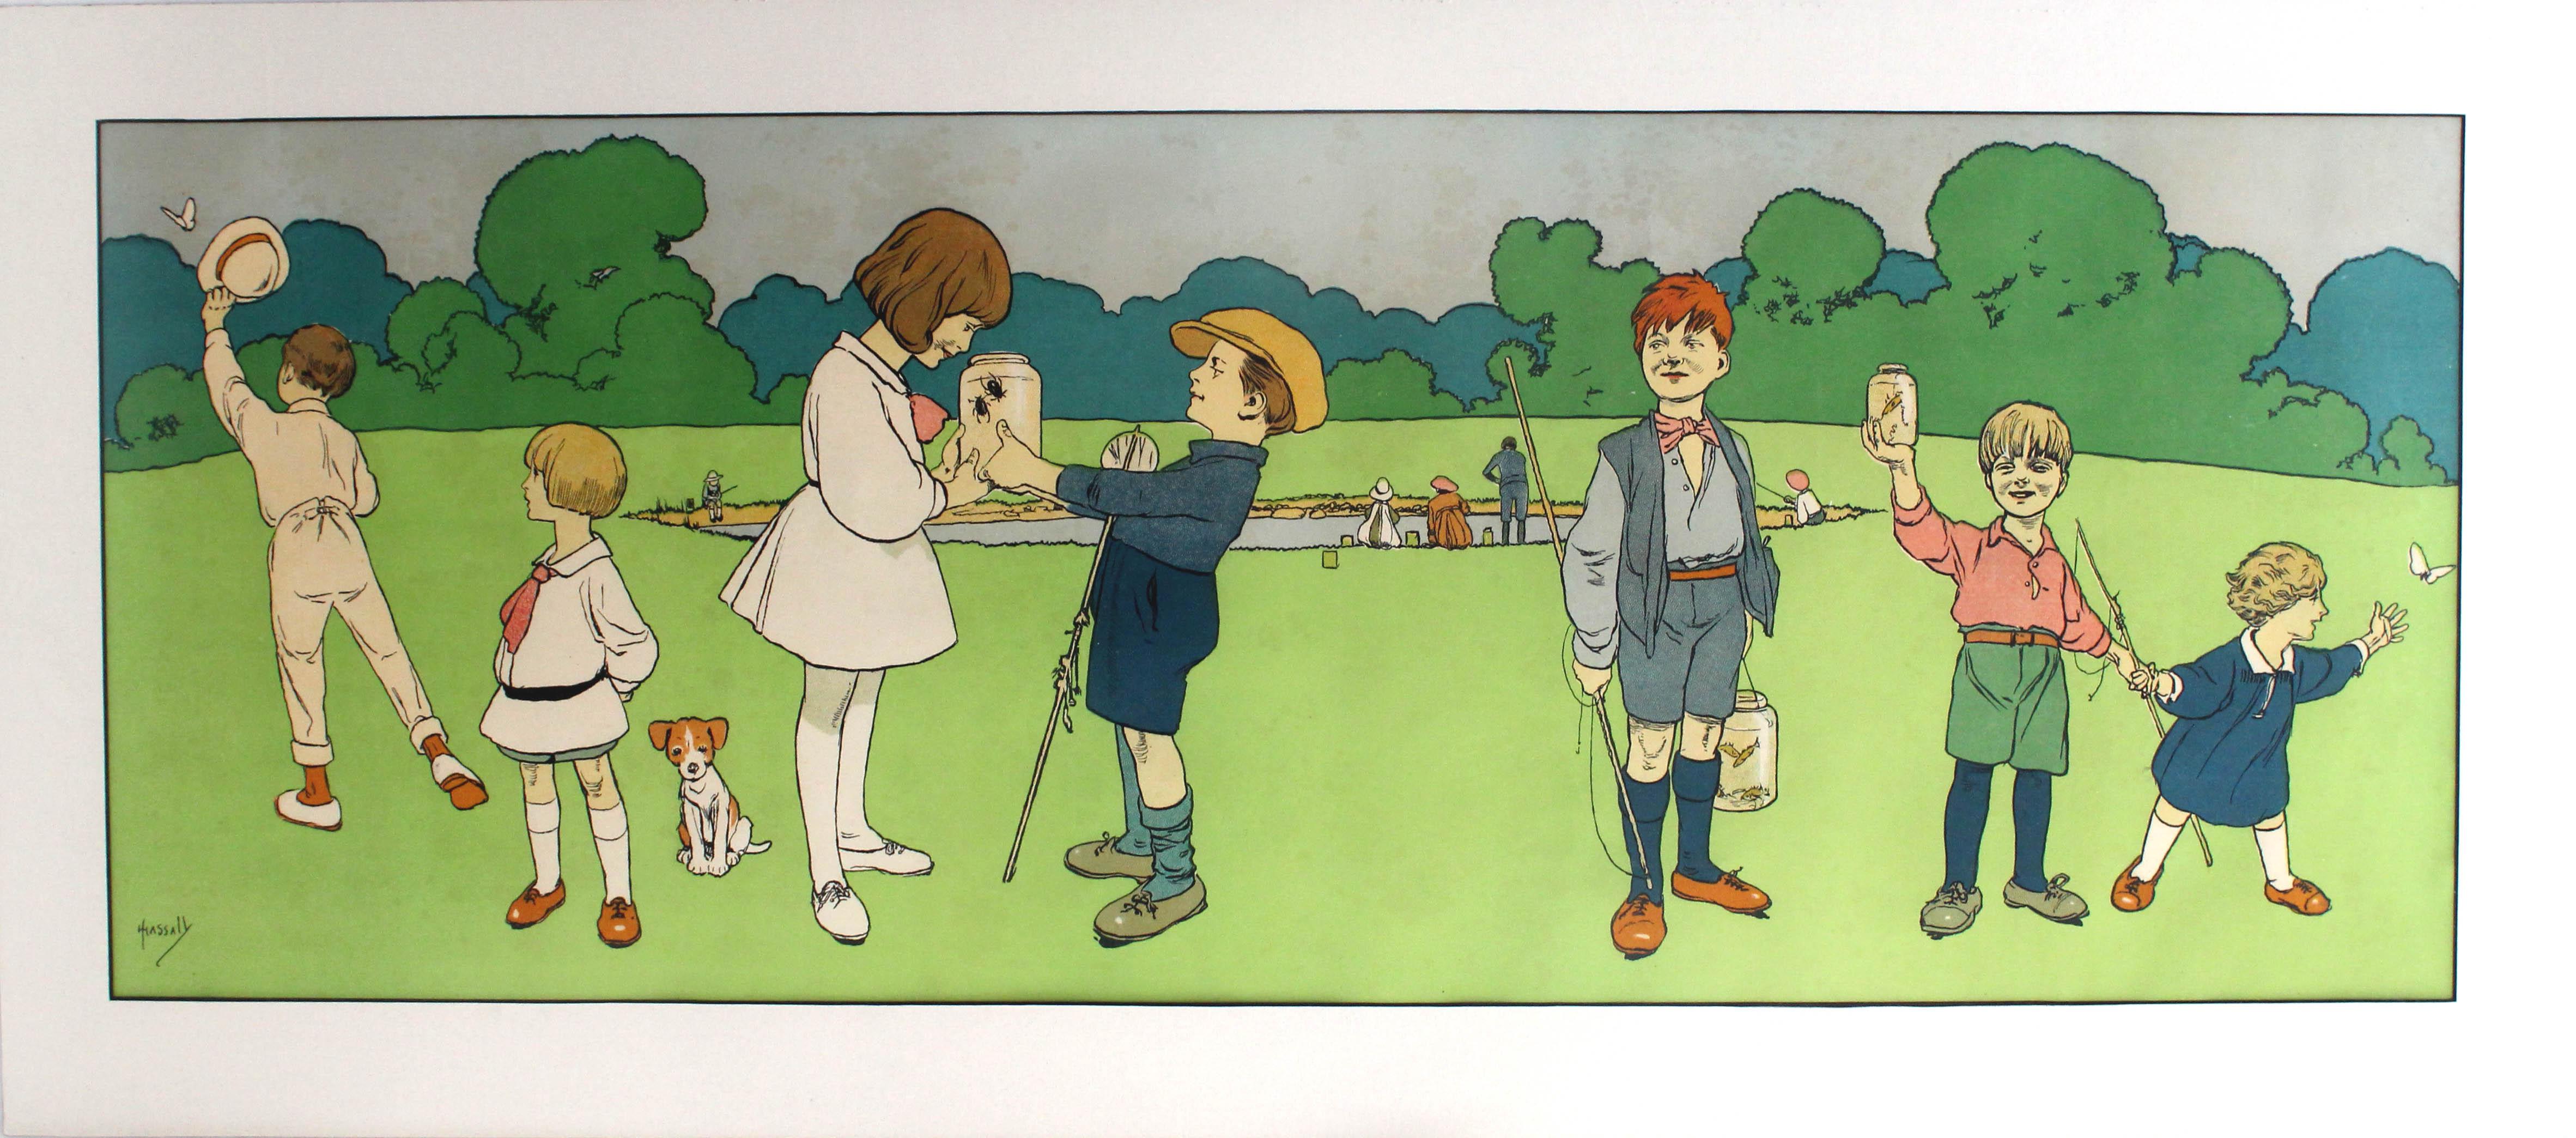 Advertising Poster Activities for Children Victorian Hassall - Image 4 of 5